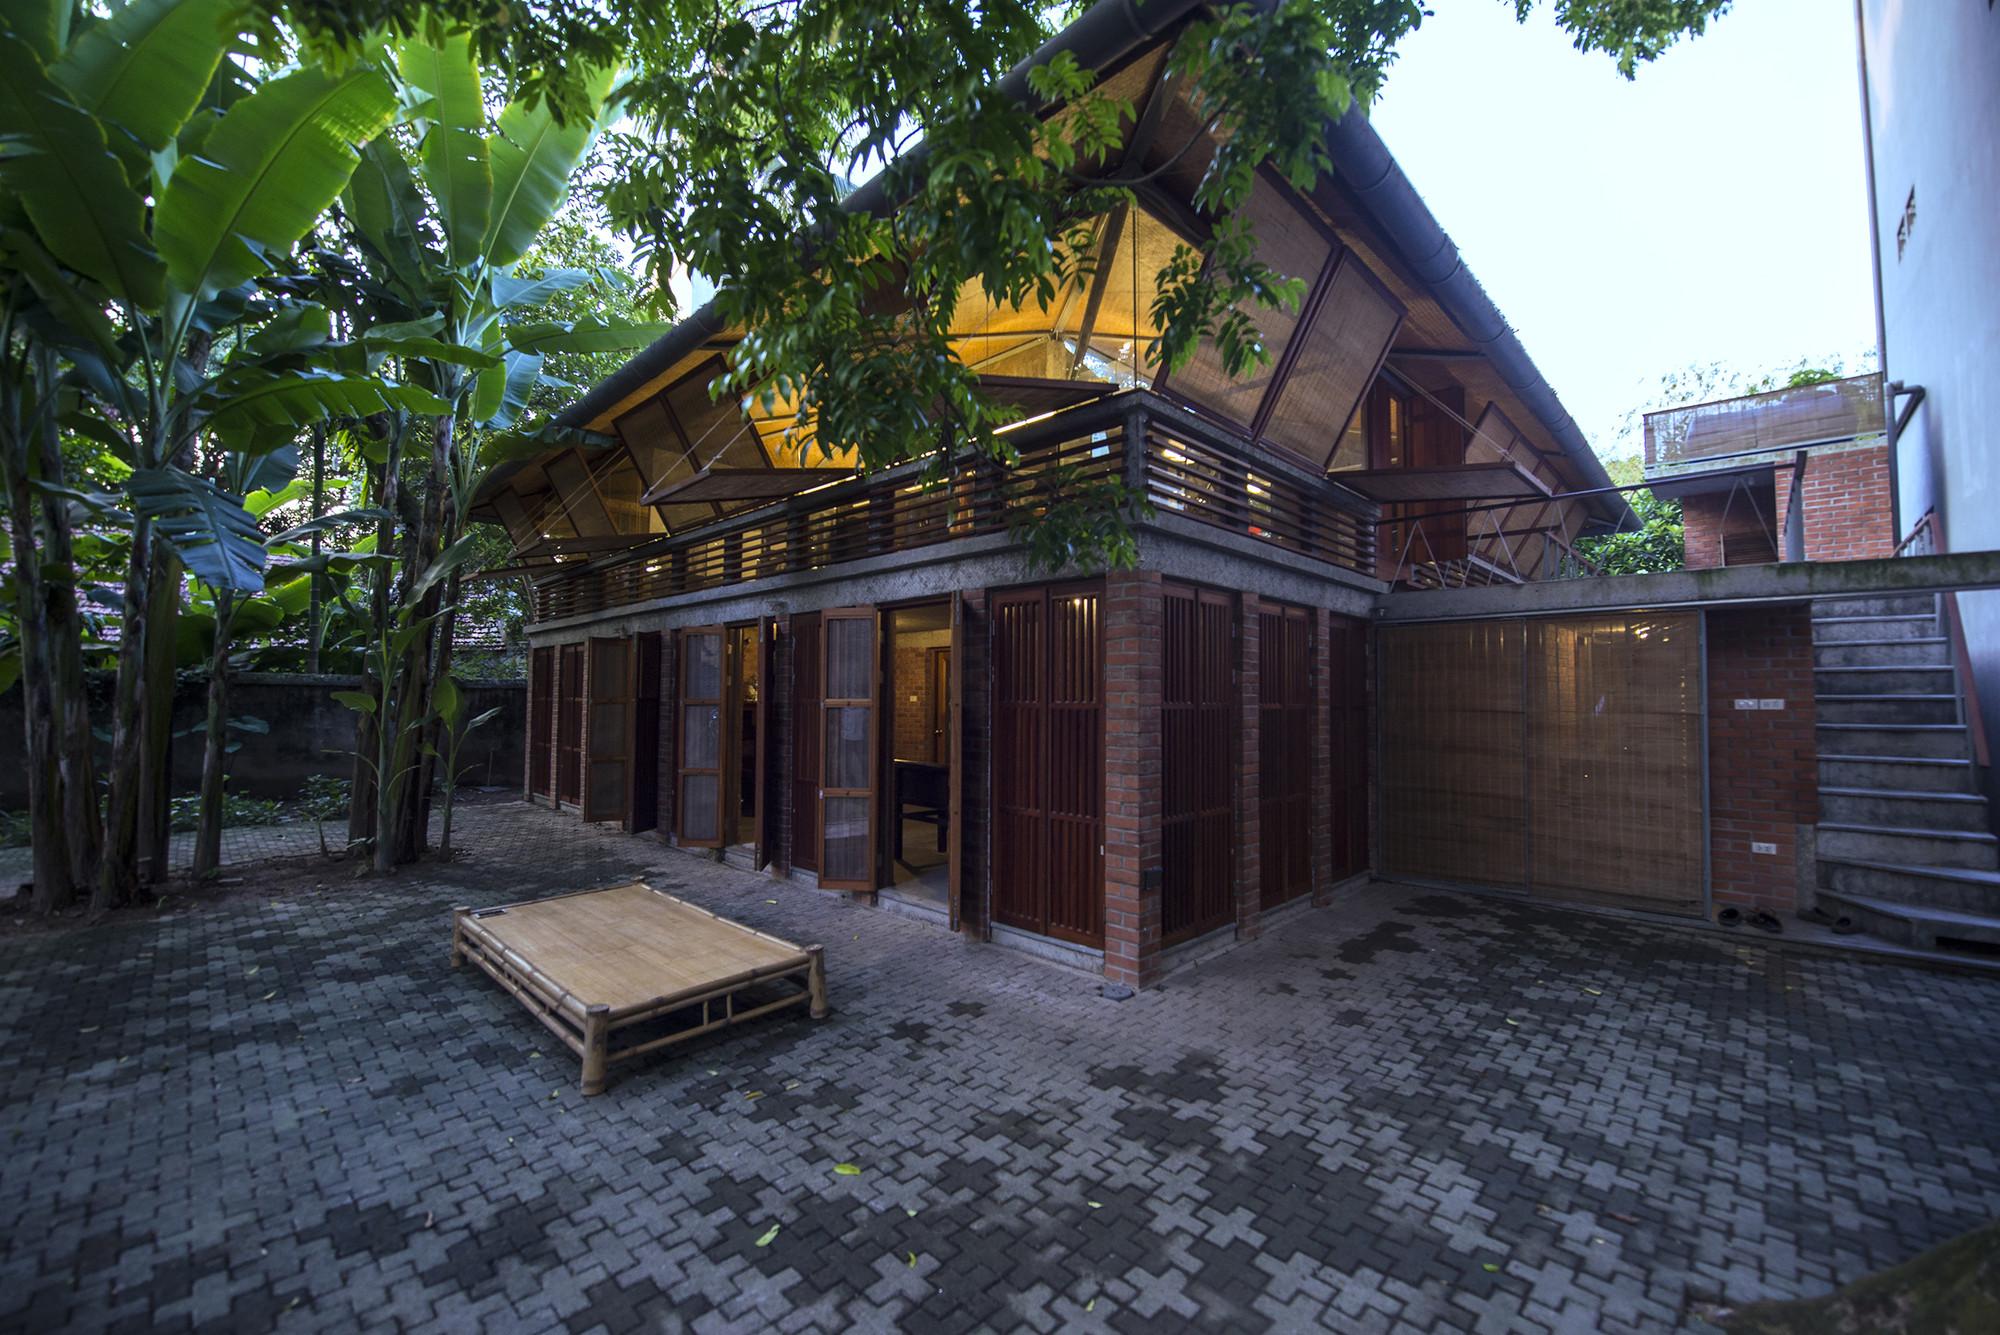 The Gentle House  / Ngoc Luong Le, Courtesy of Ngoc Luong Le